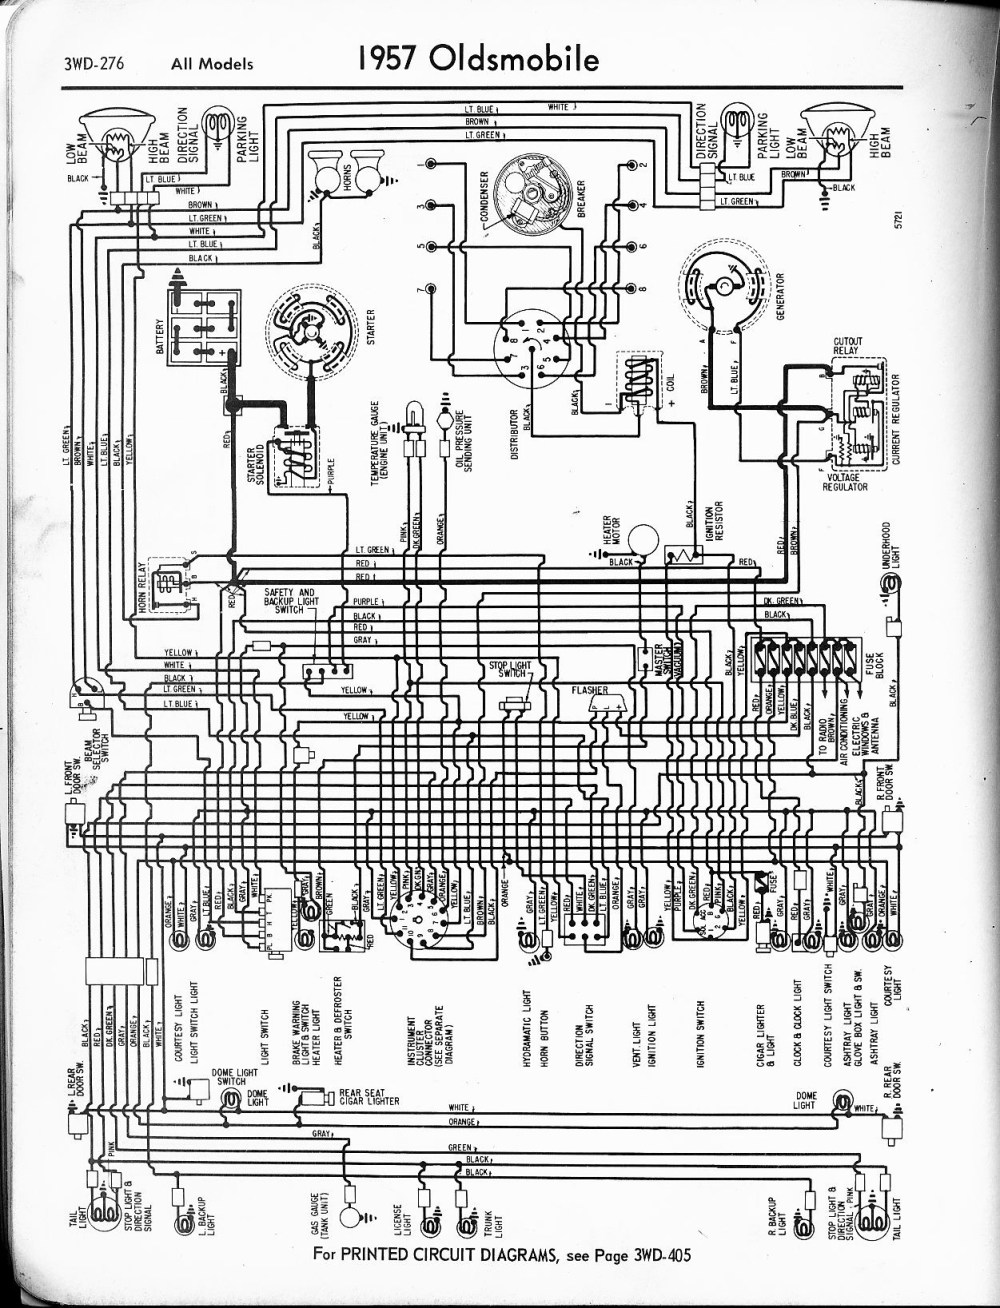 medium resolution of pontiac 3800 engine diagram wiring diagram besides 1996 oldsmobile cutlass engine wiring diagram of pontiac 3800